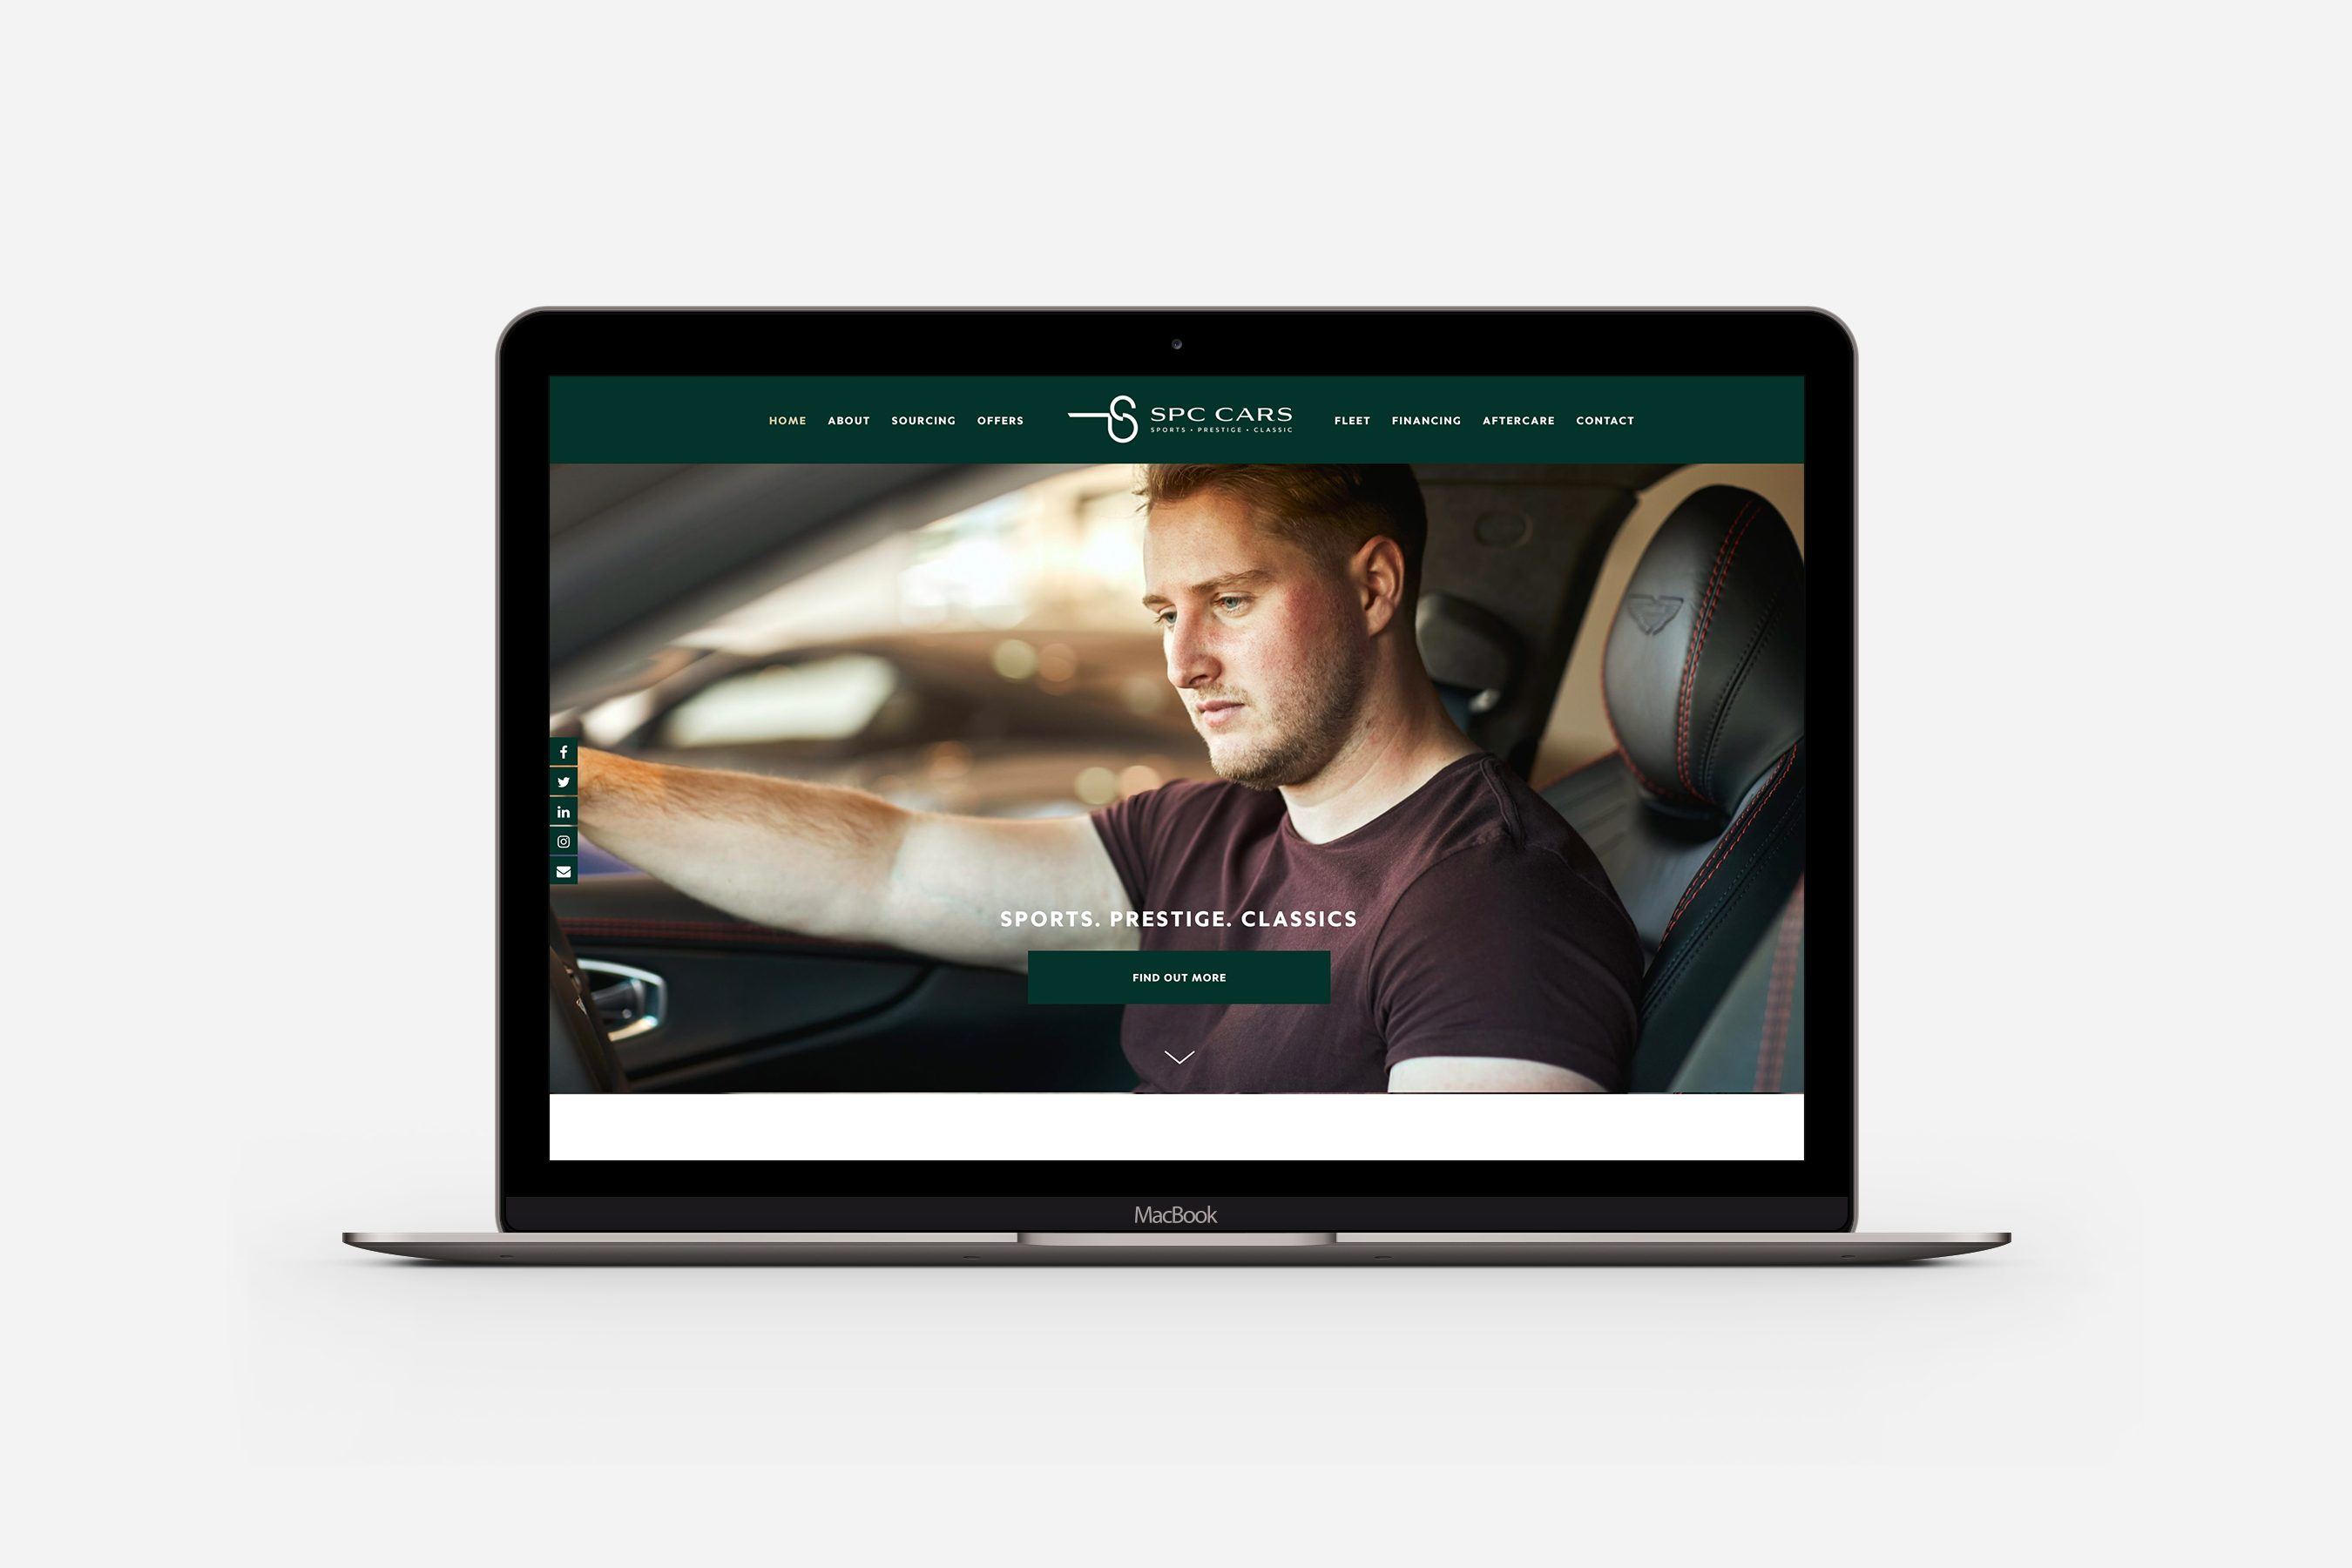 spc-cars-screen